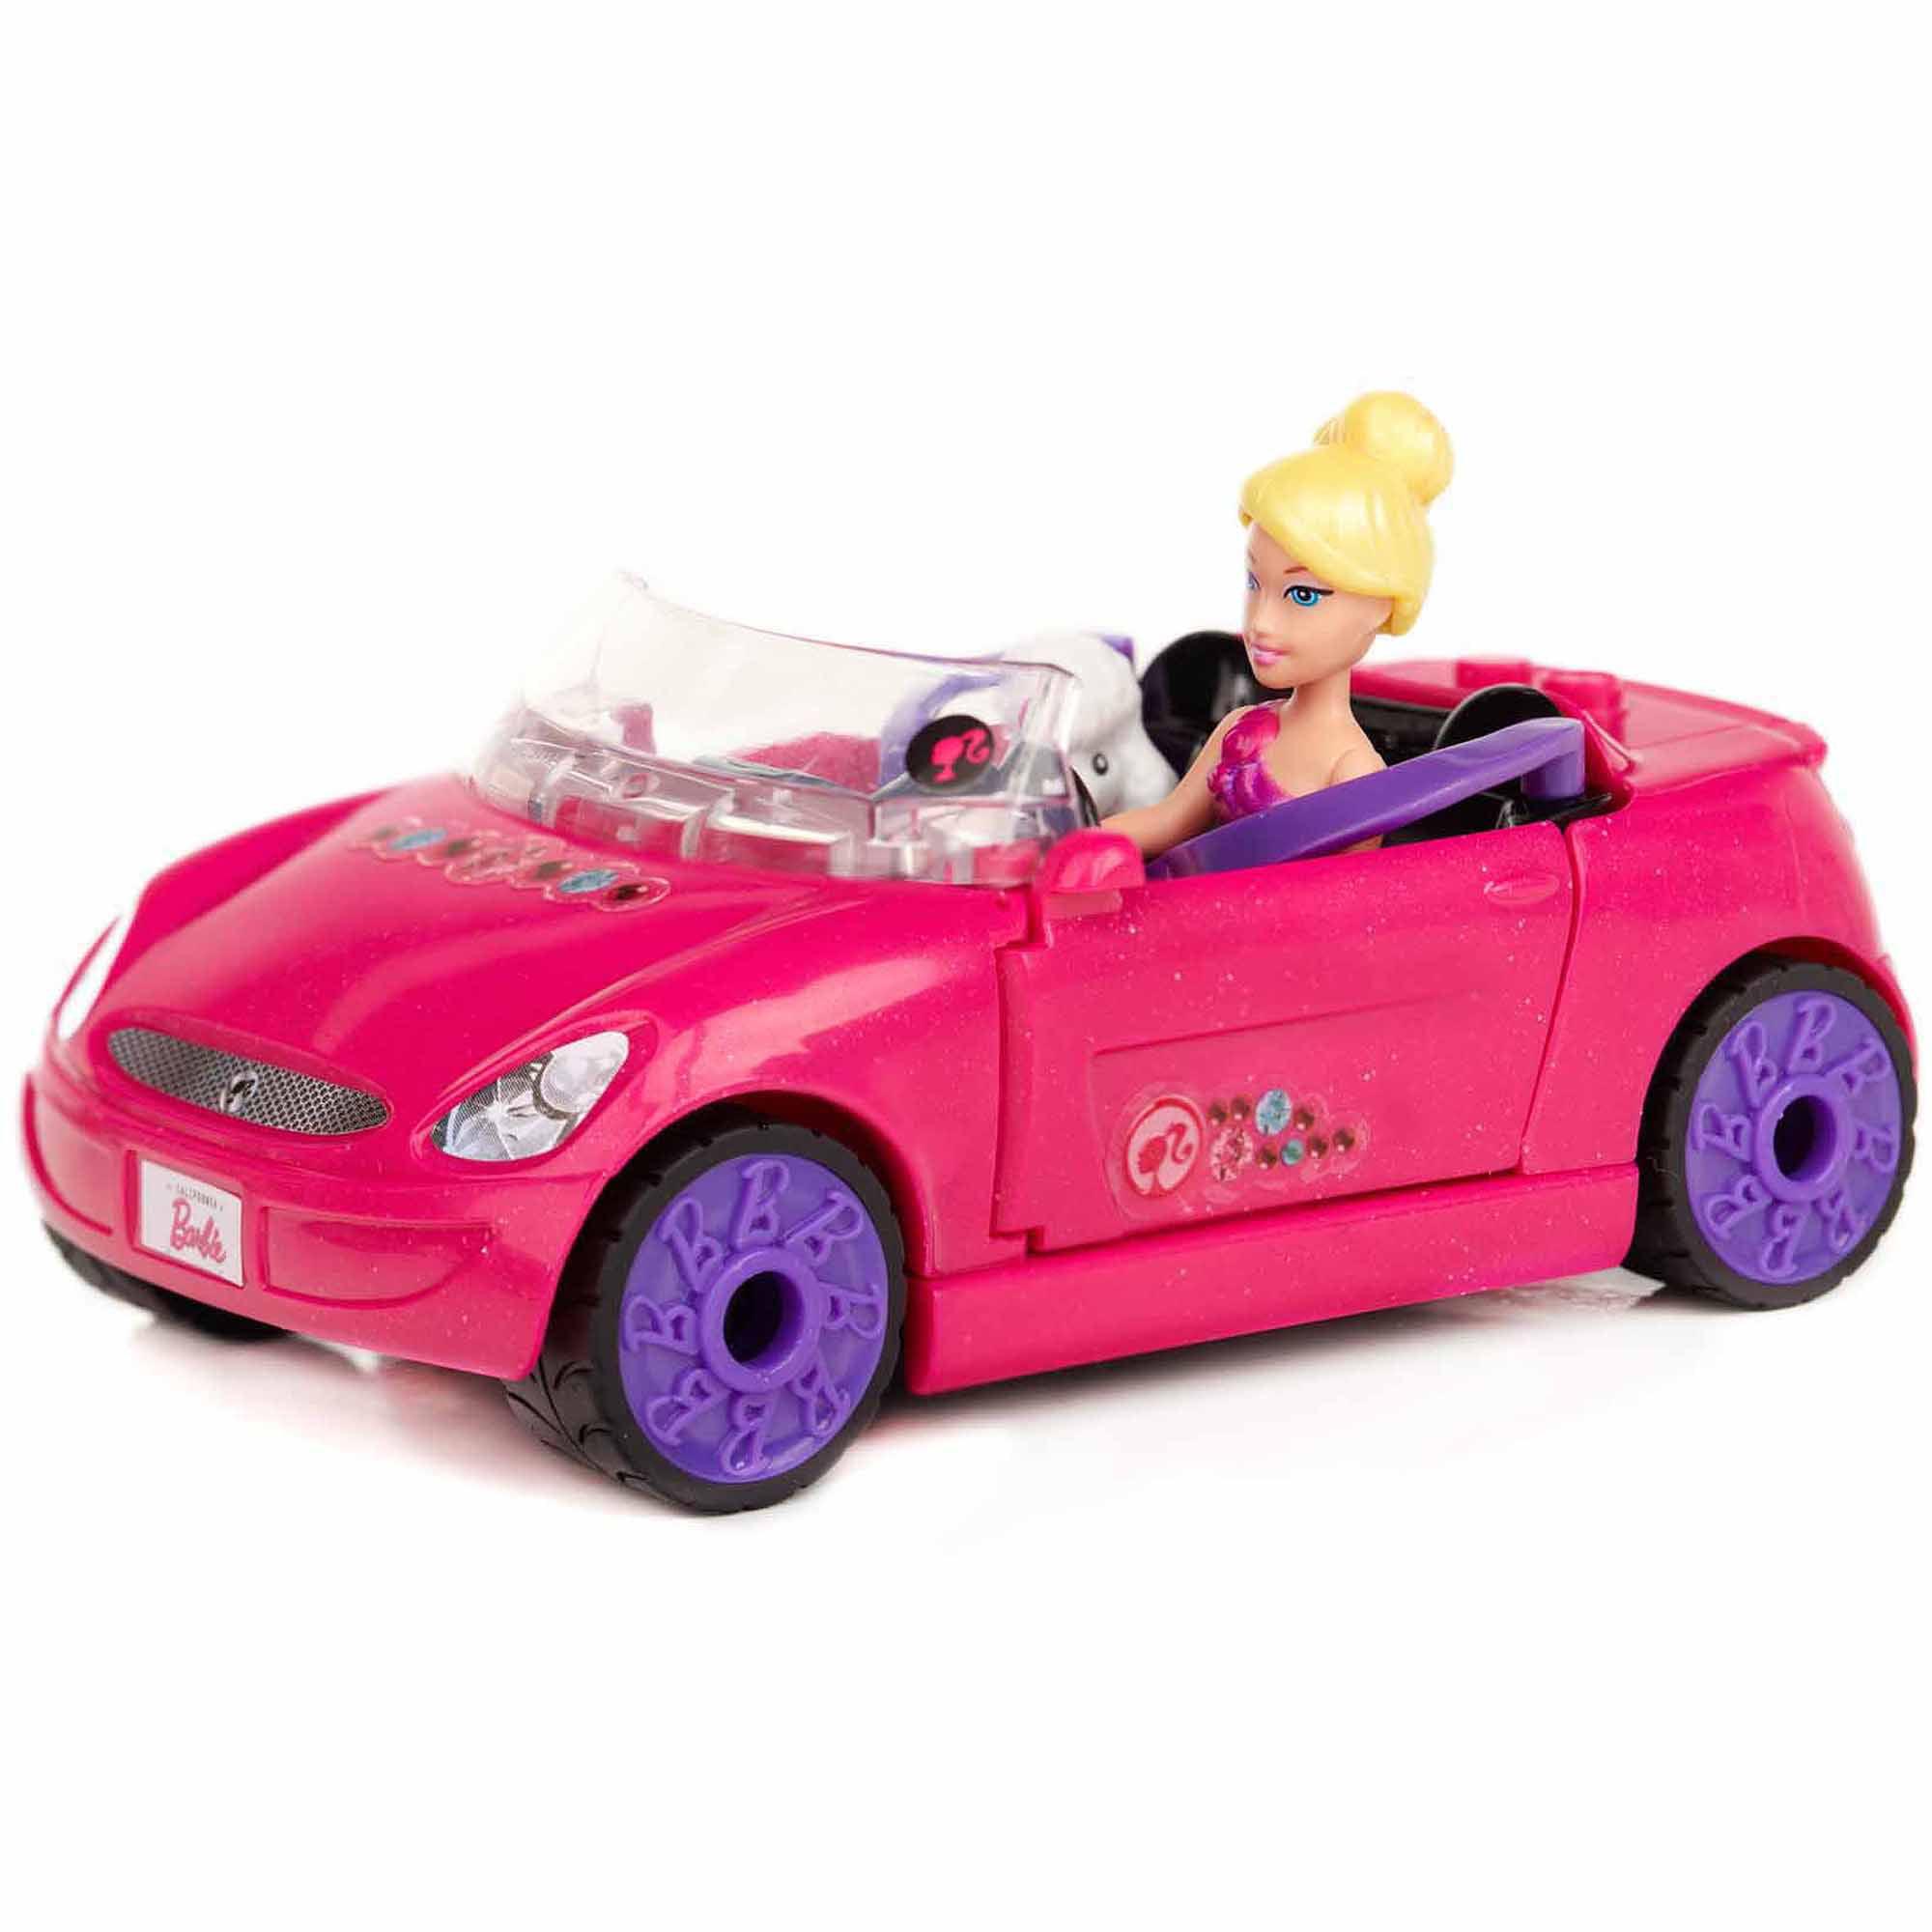 Mega Bloks Barbie Build 'n Style Convertible Play Set